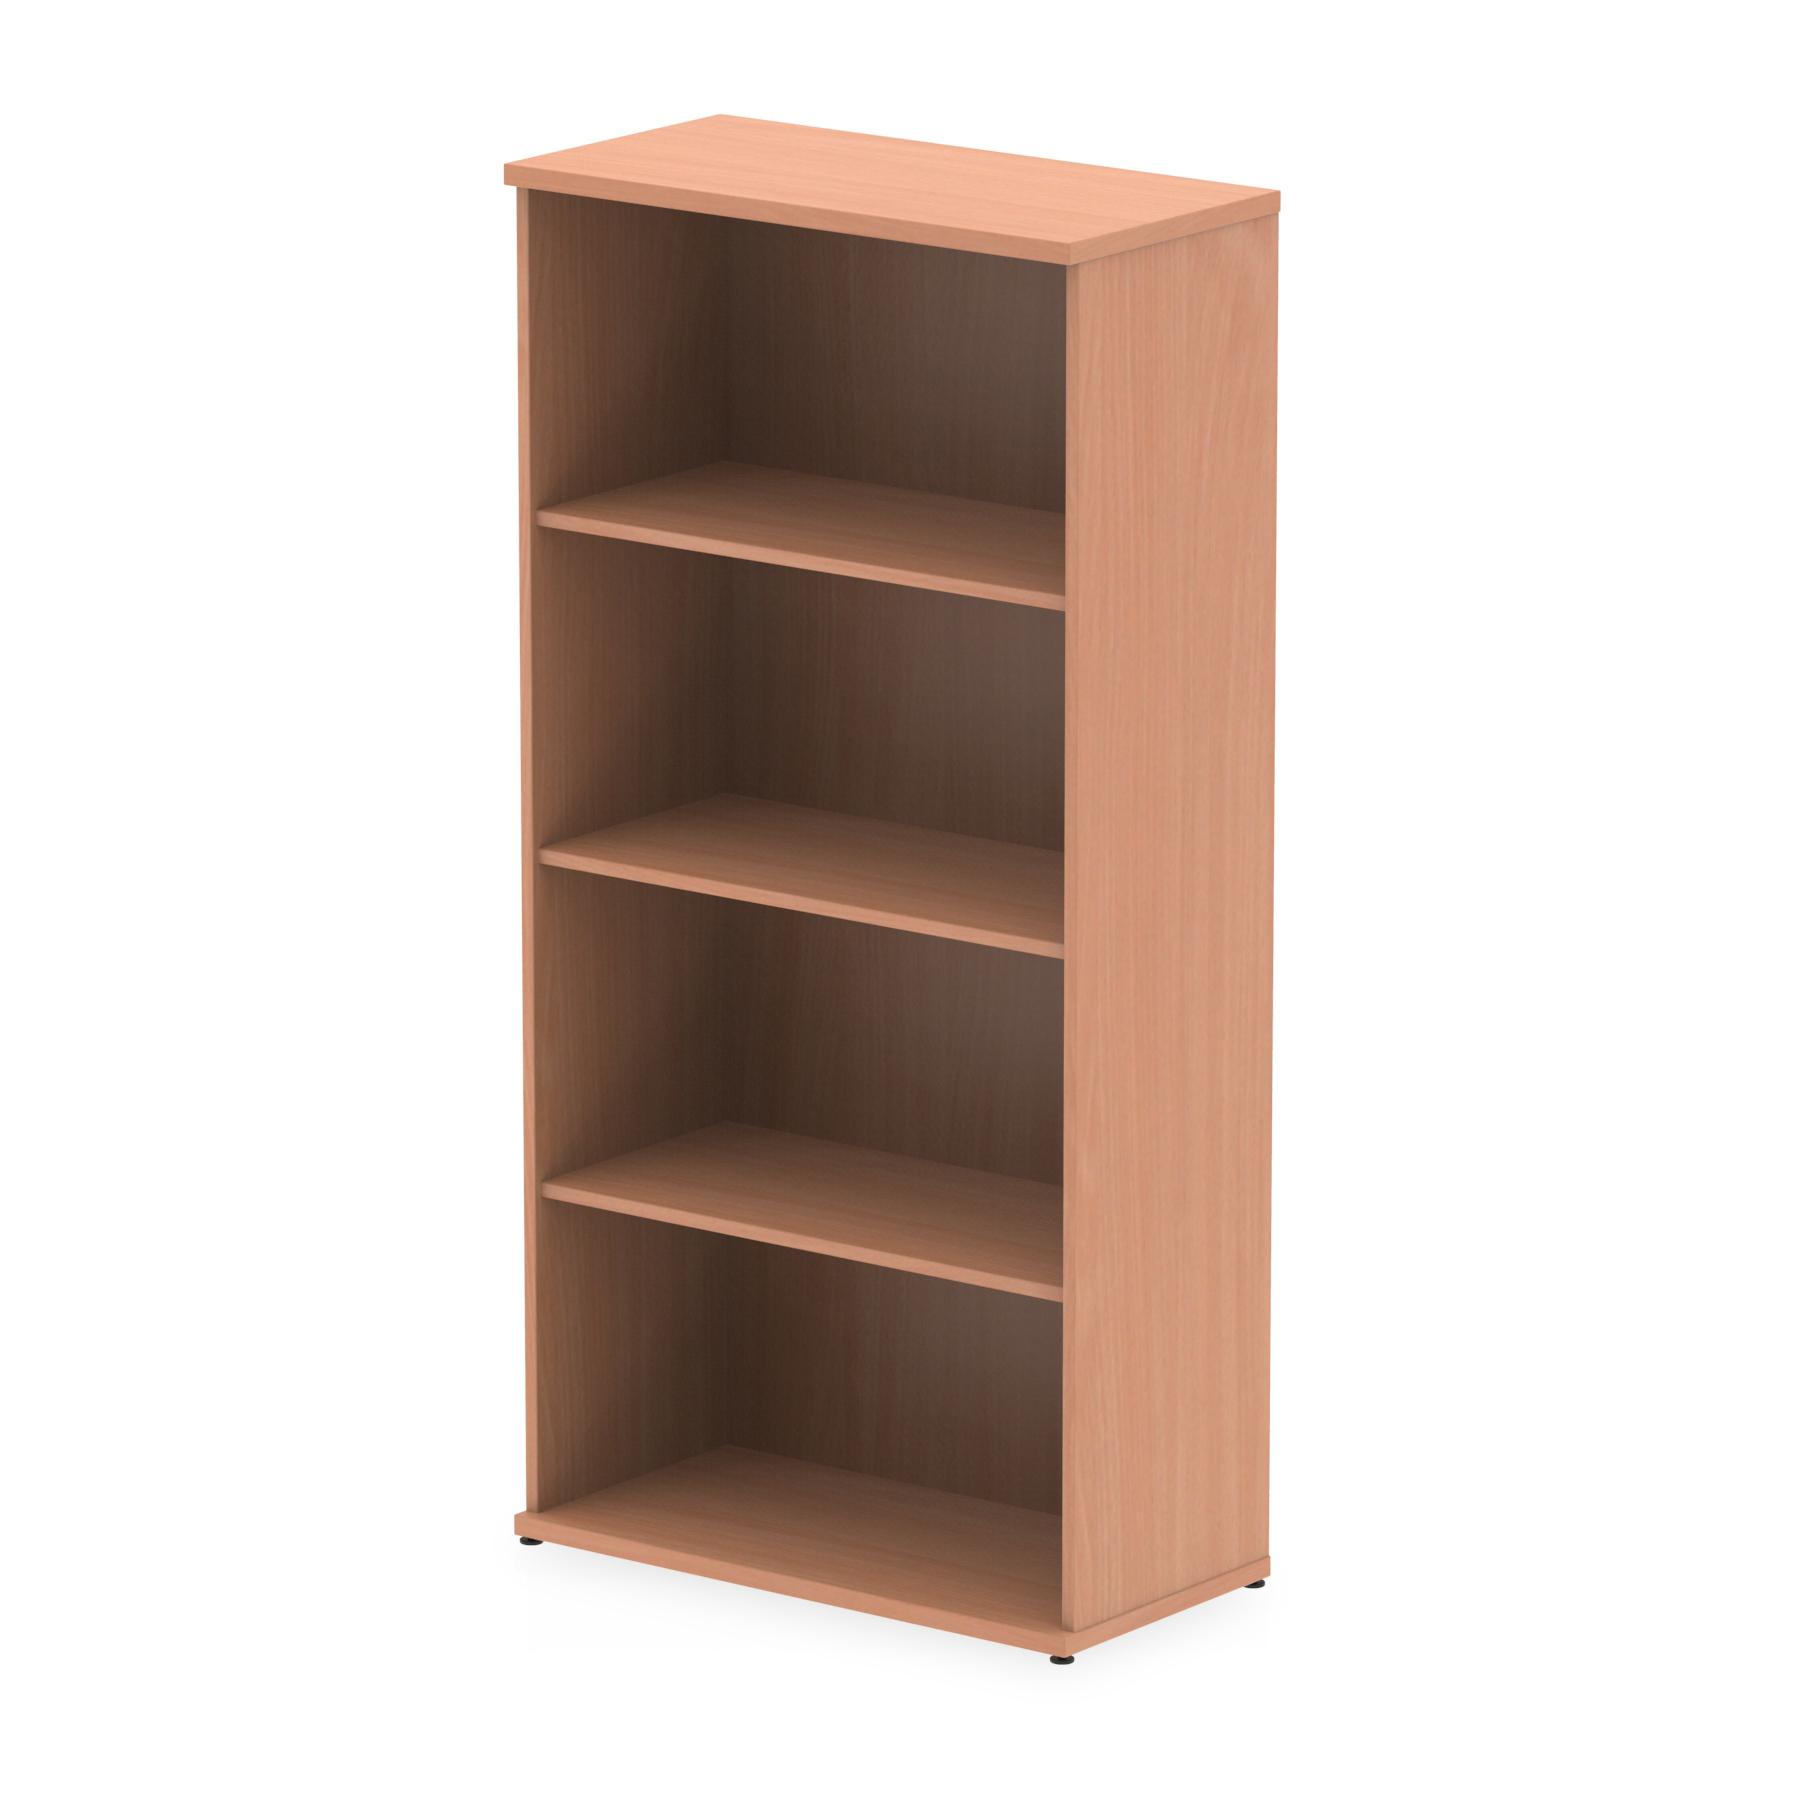 Impulse 1600mm Bookcase Beech I000051